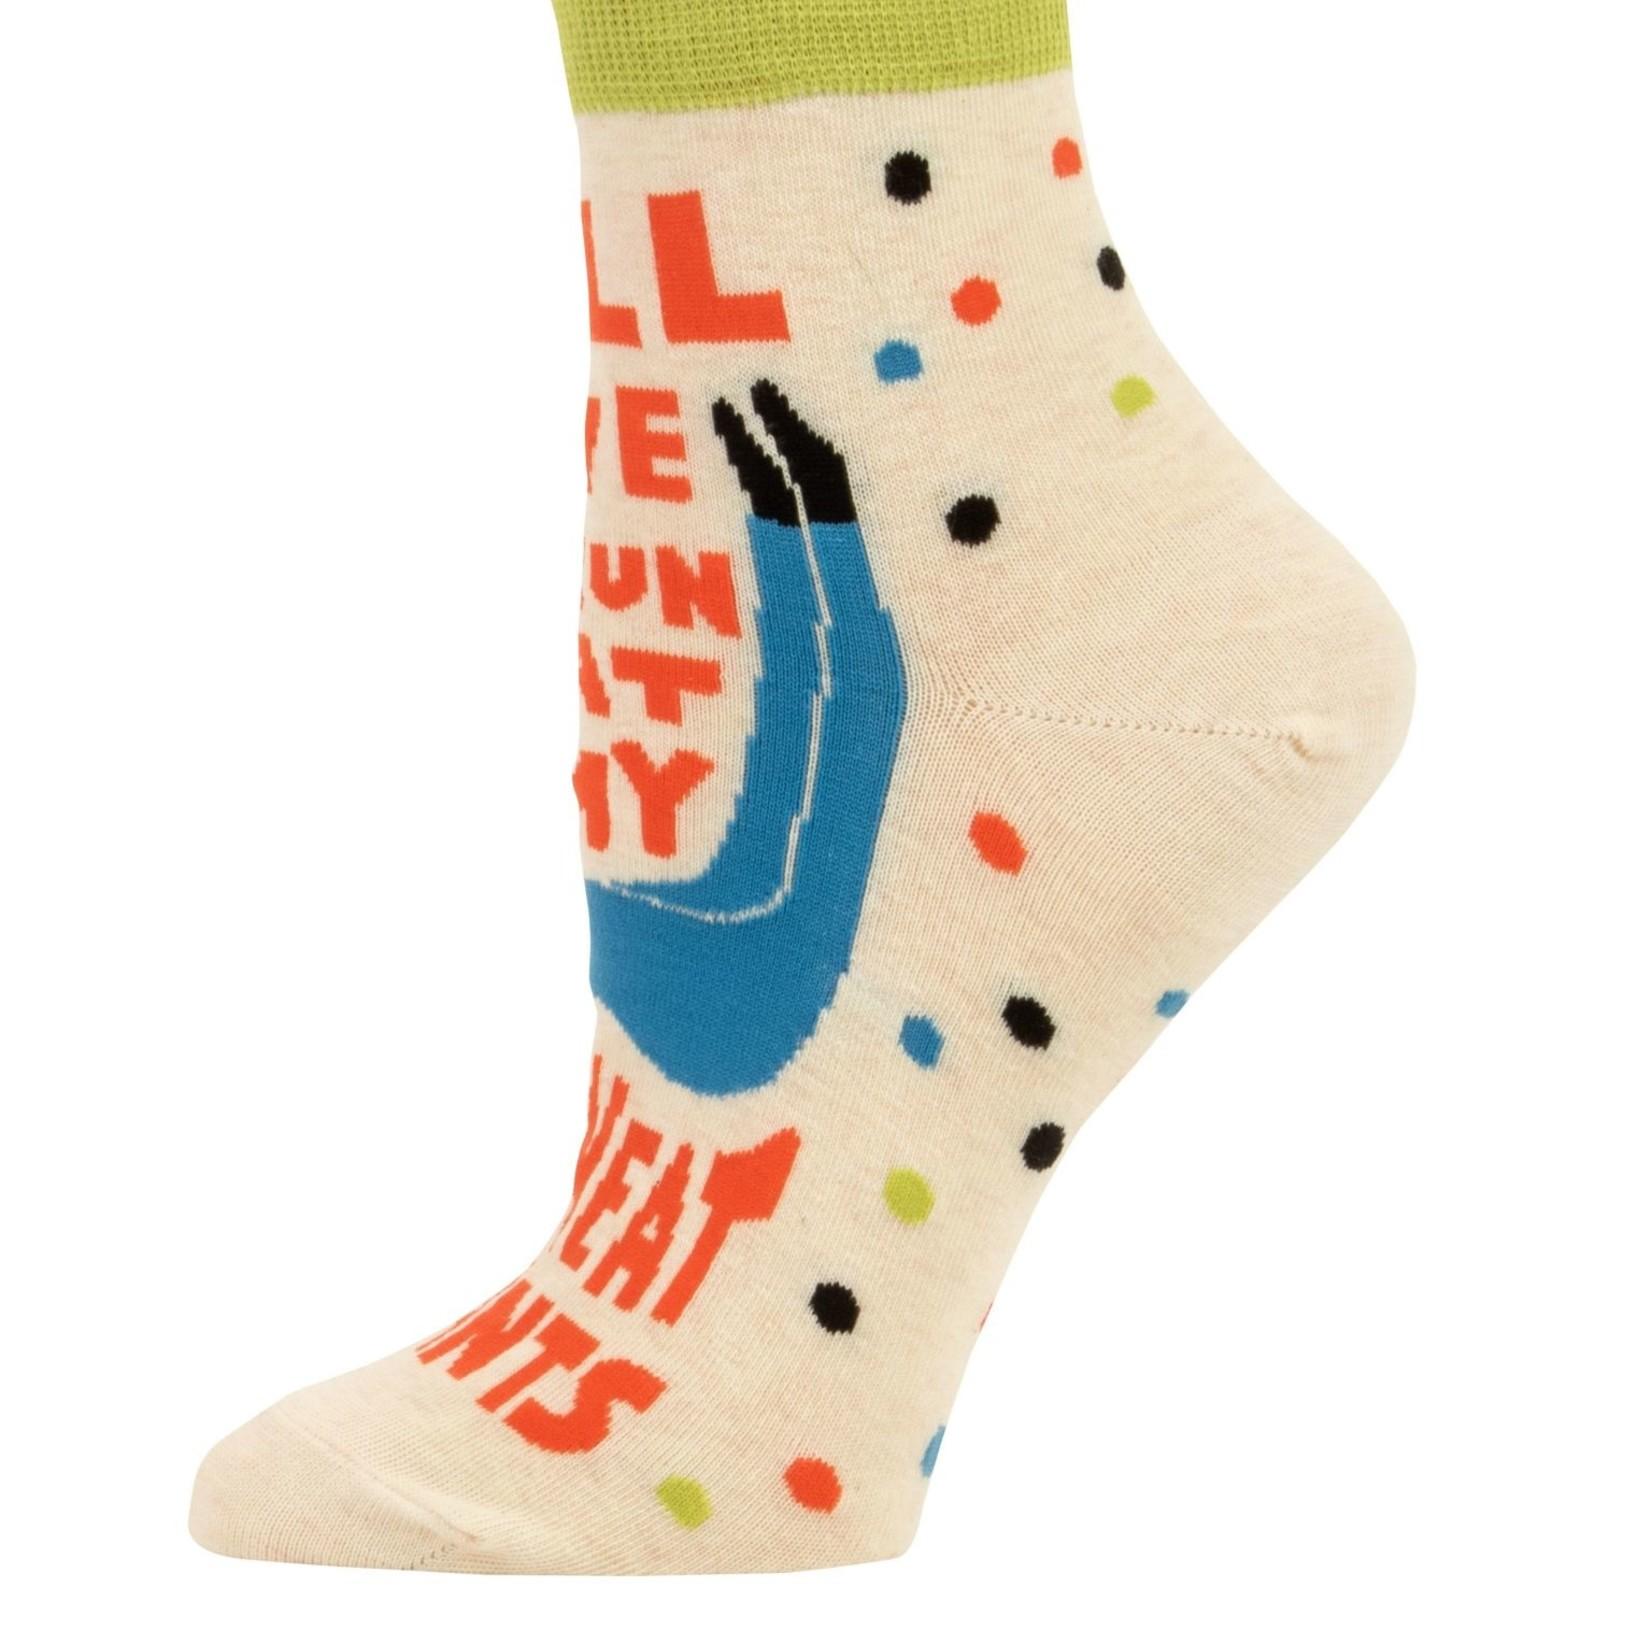 My Sweatpants Ankle Socks